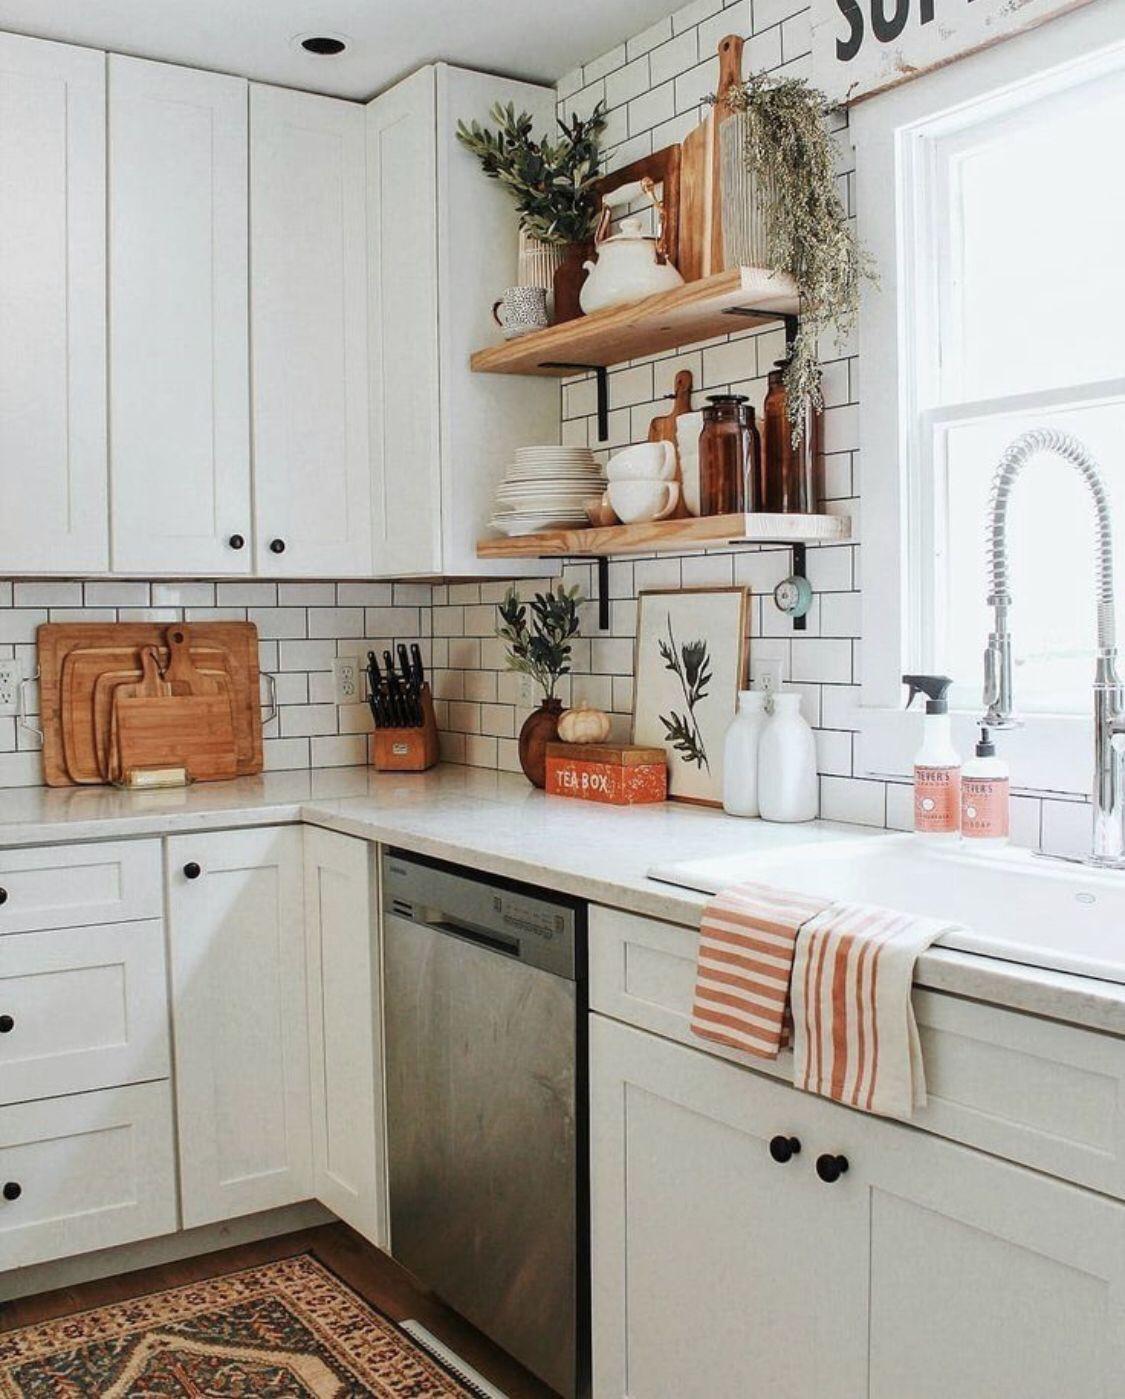 Shop Home Decor @Target  Home kitchens, Home, Kitchen inspirations